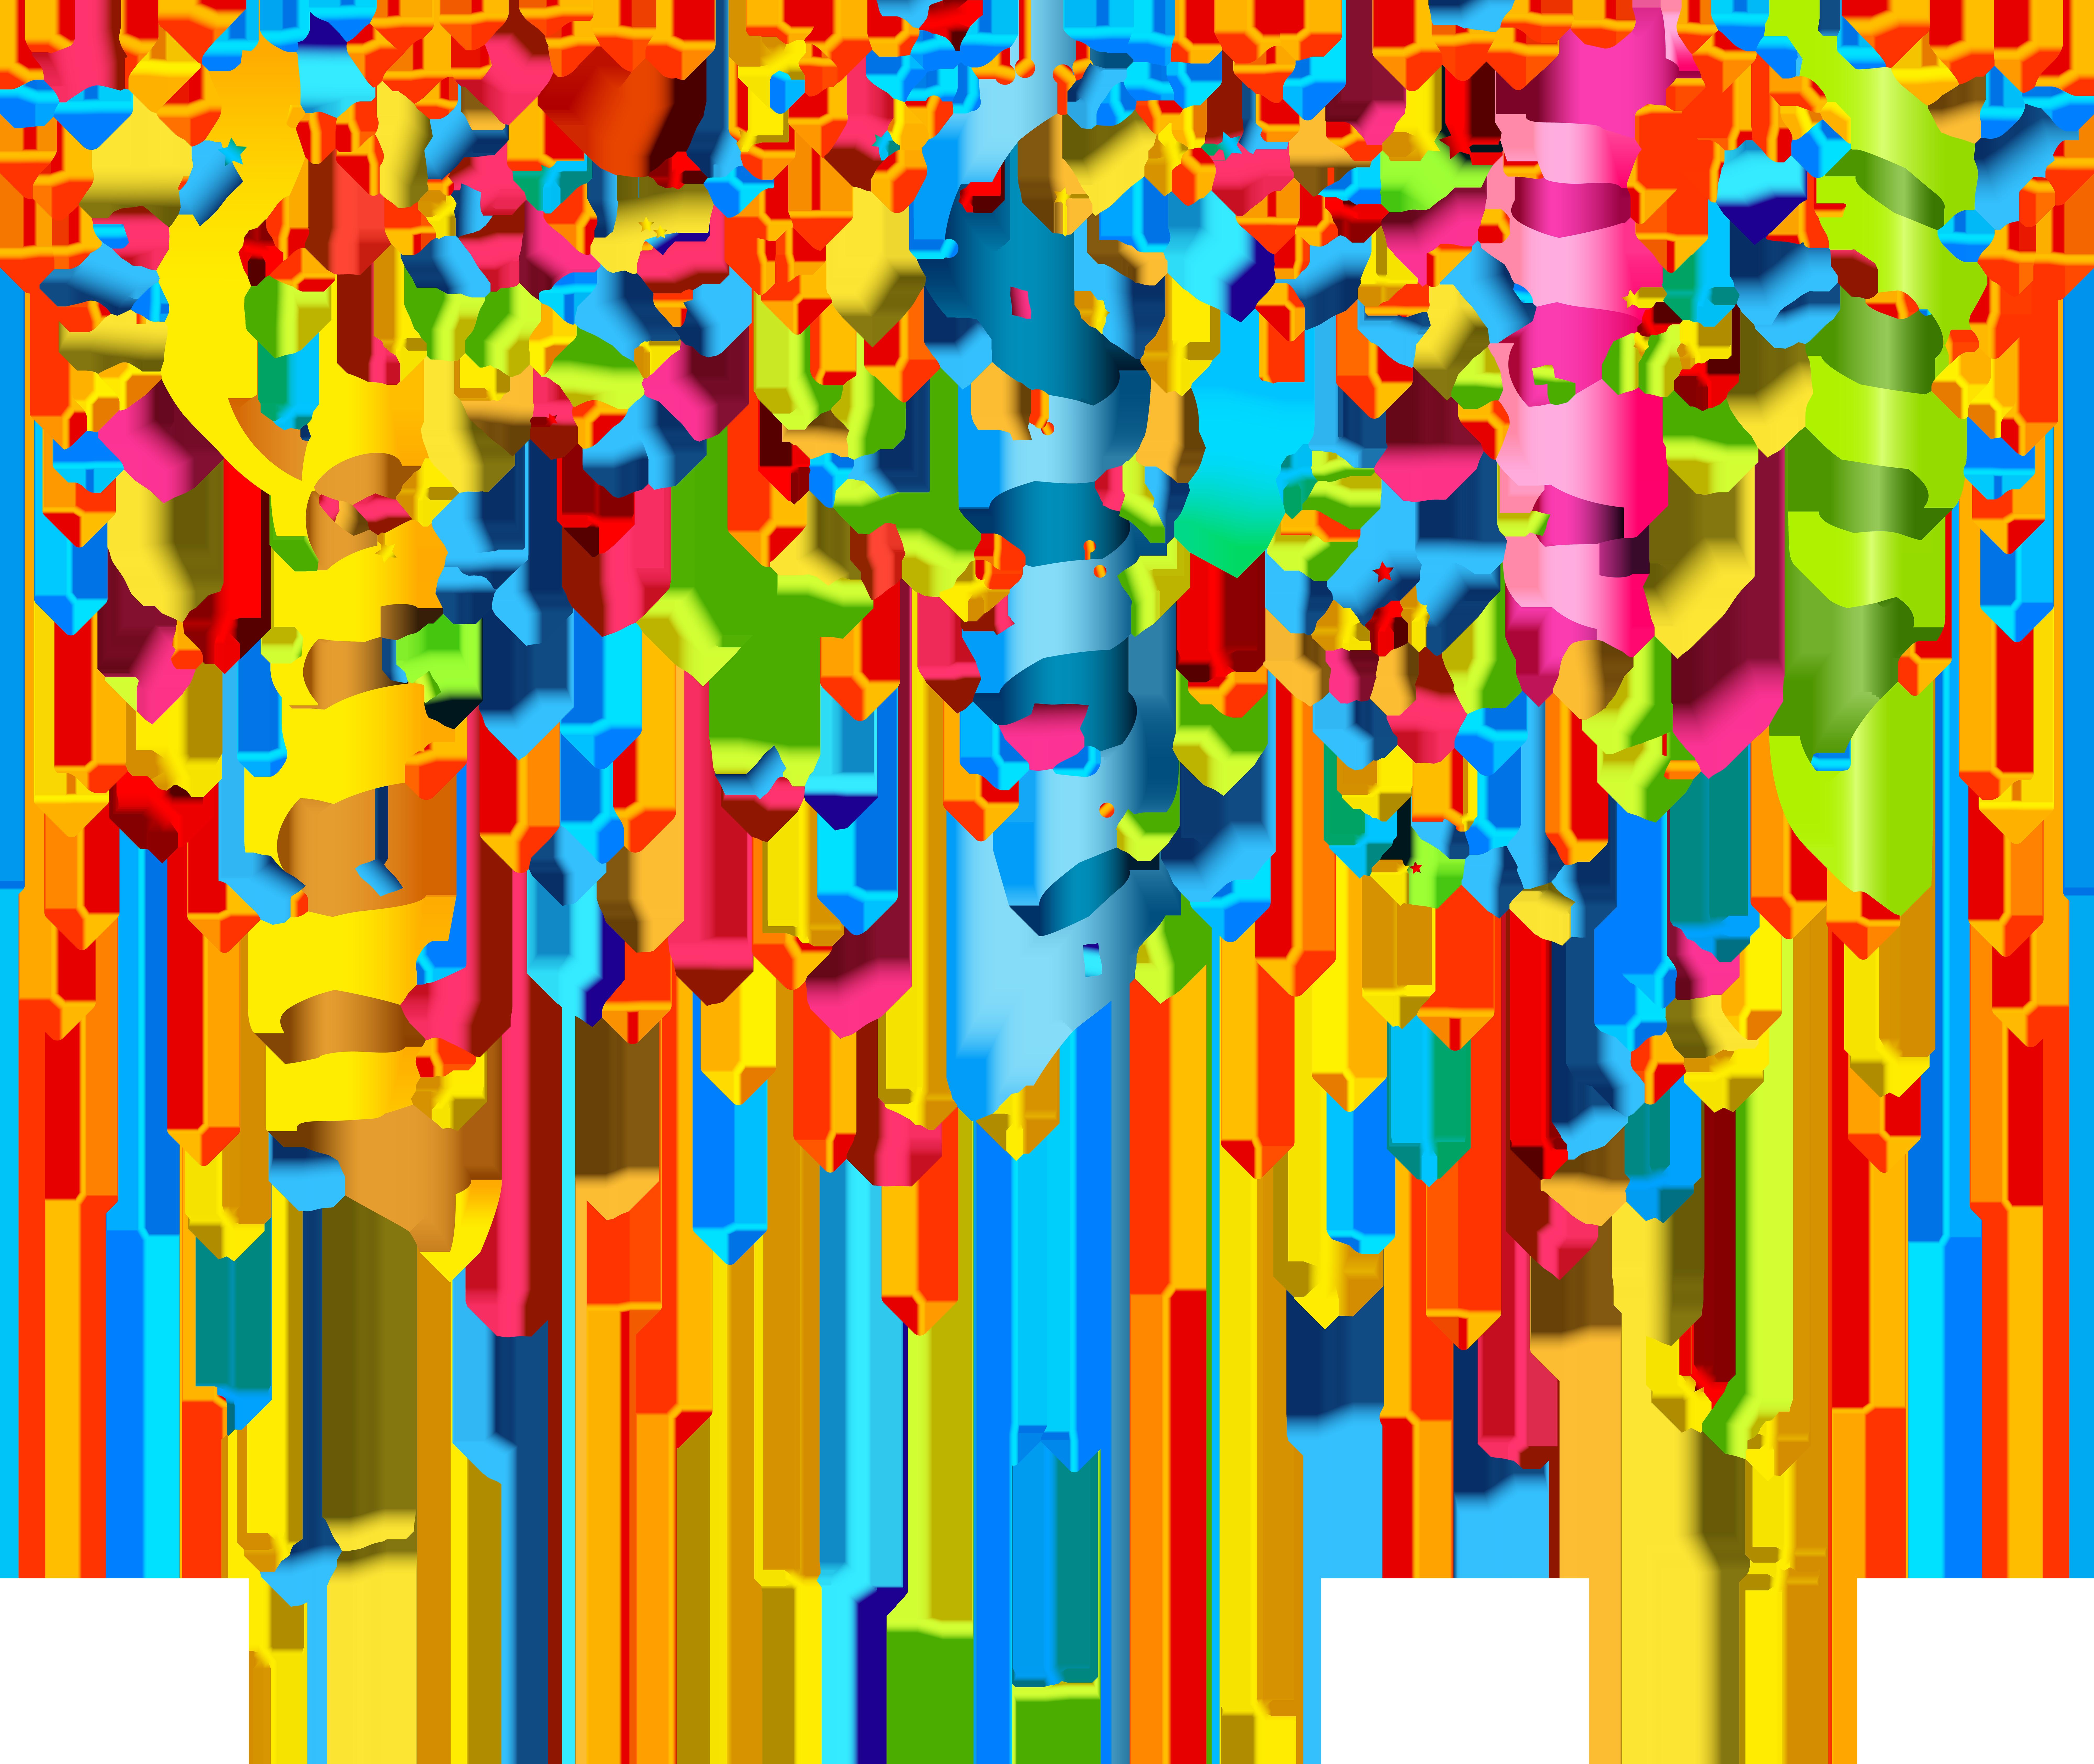 Confetti Transparent PNG Image.